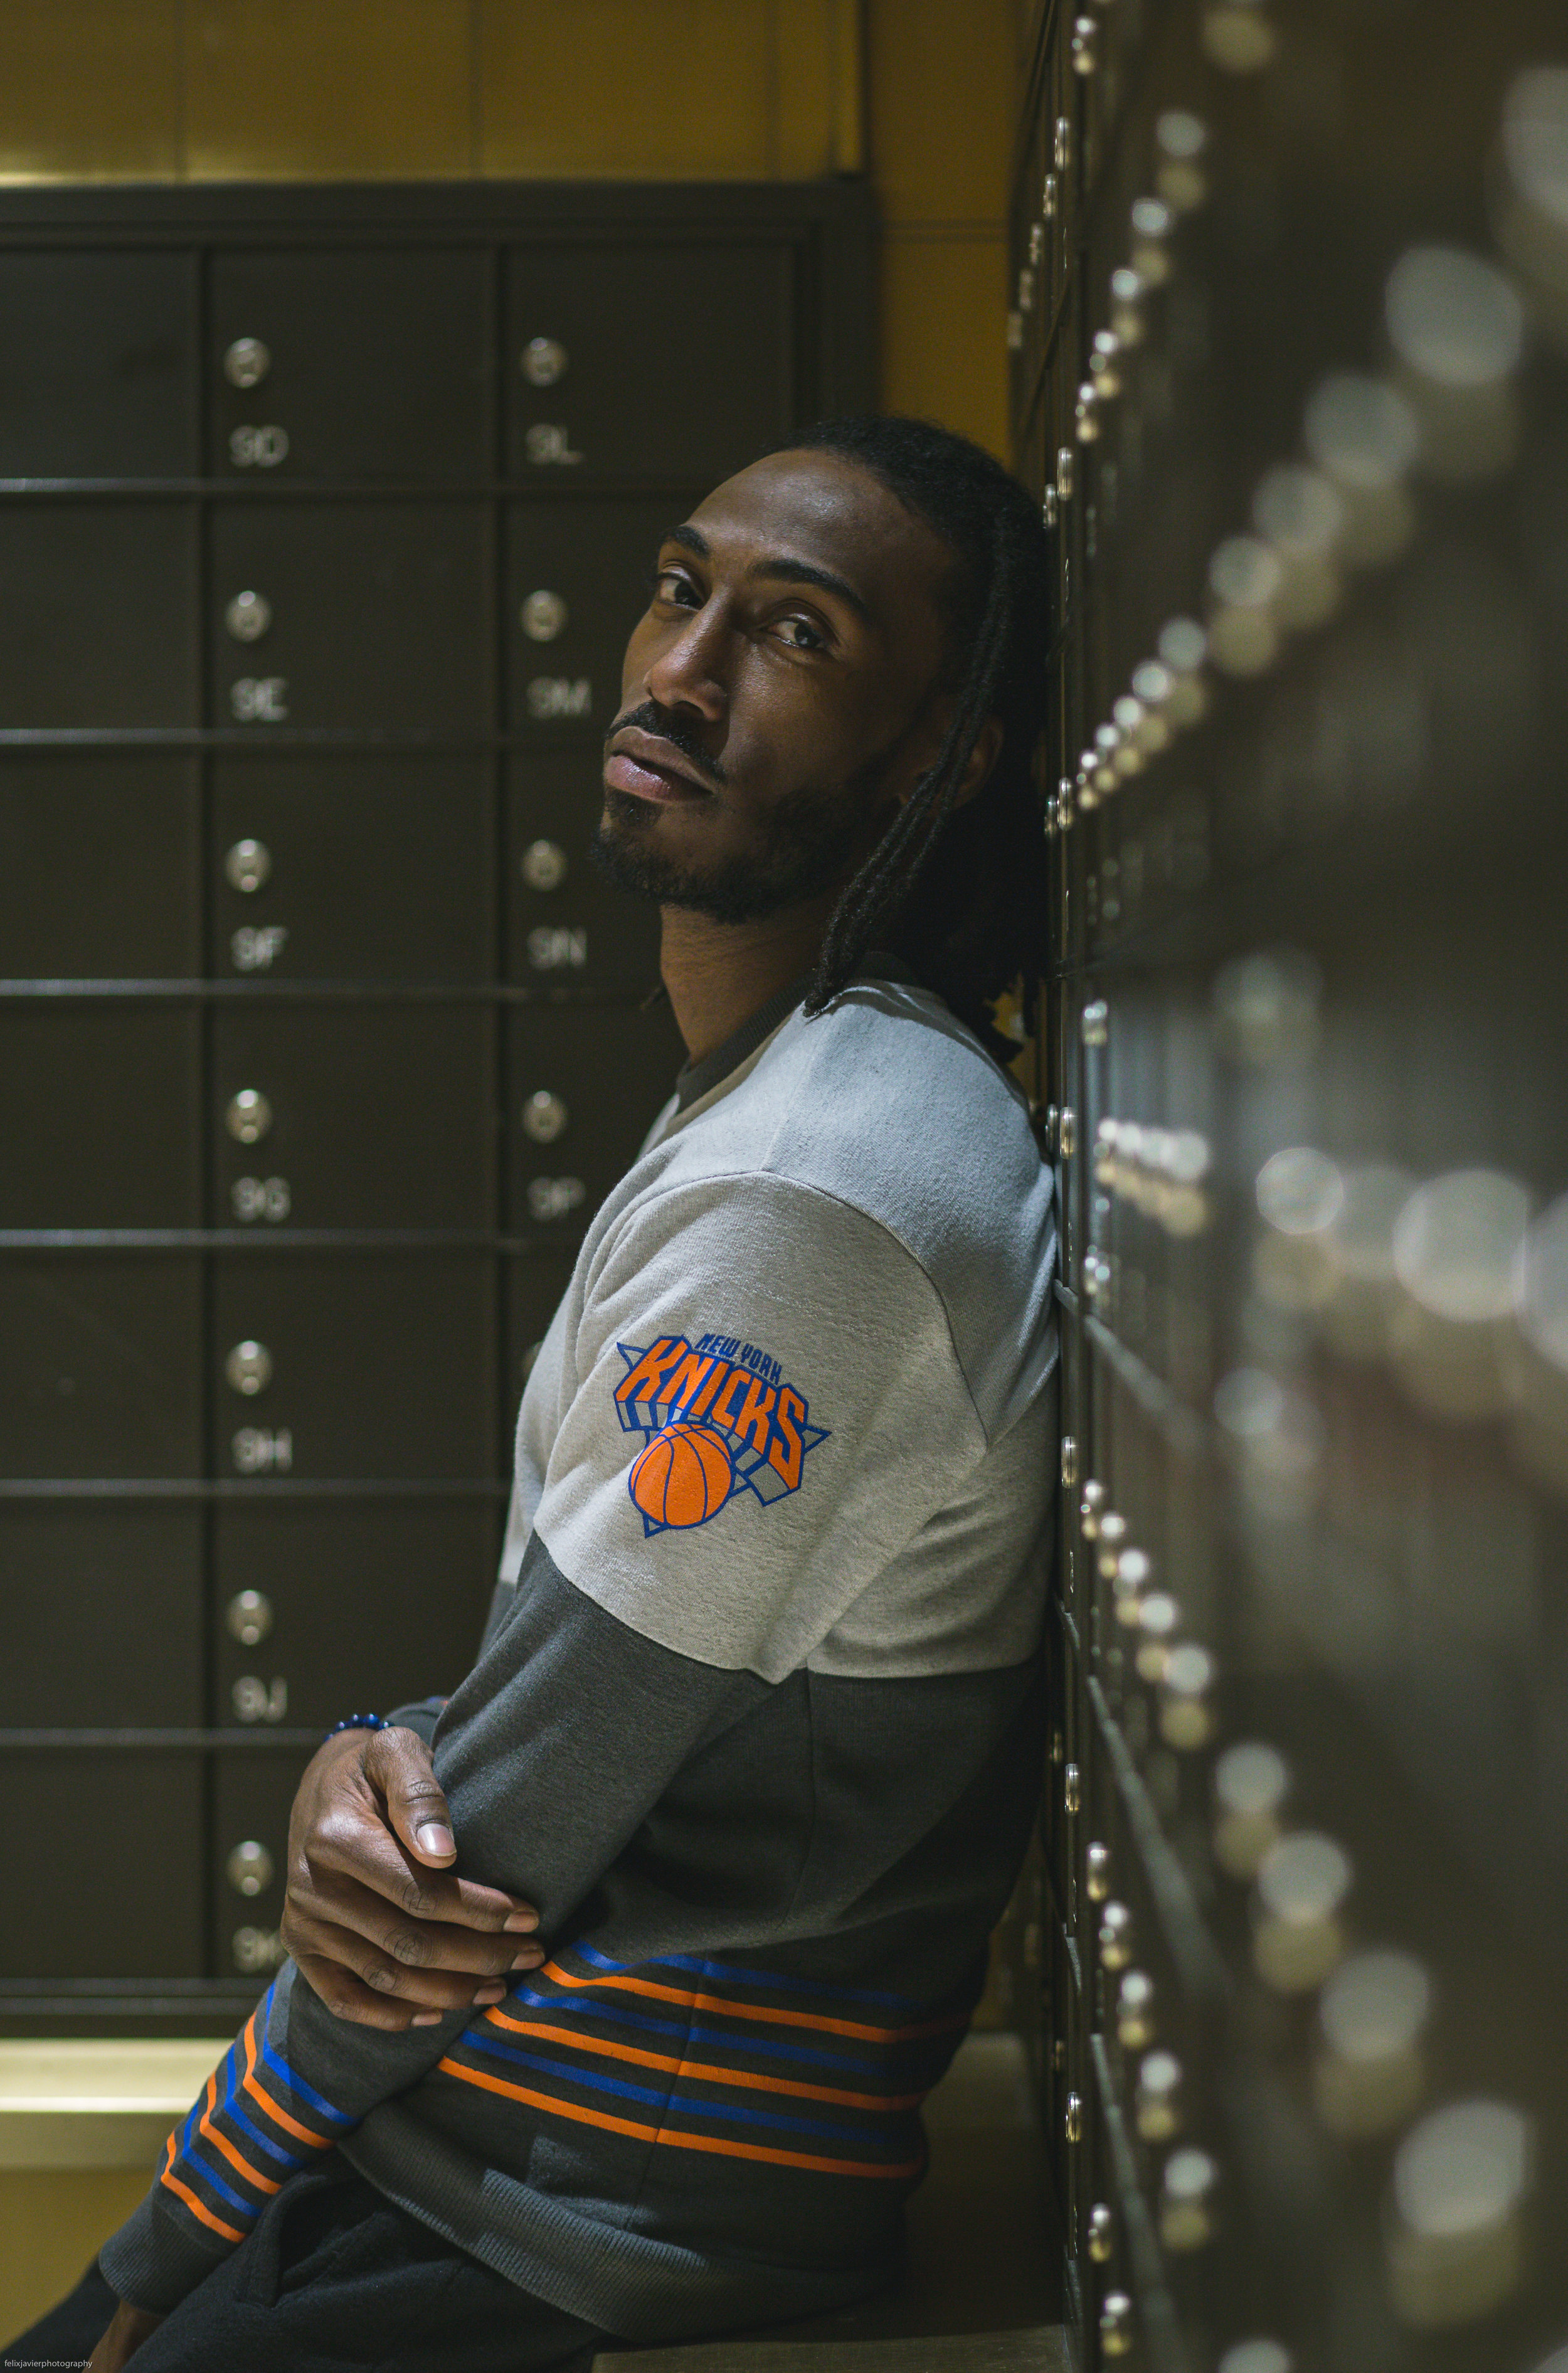 Grungy Gentleman x New York Knicks 12.jpg